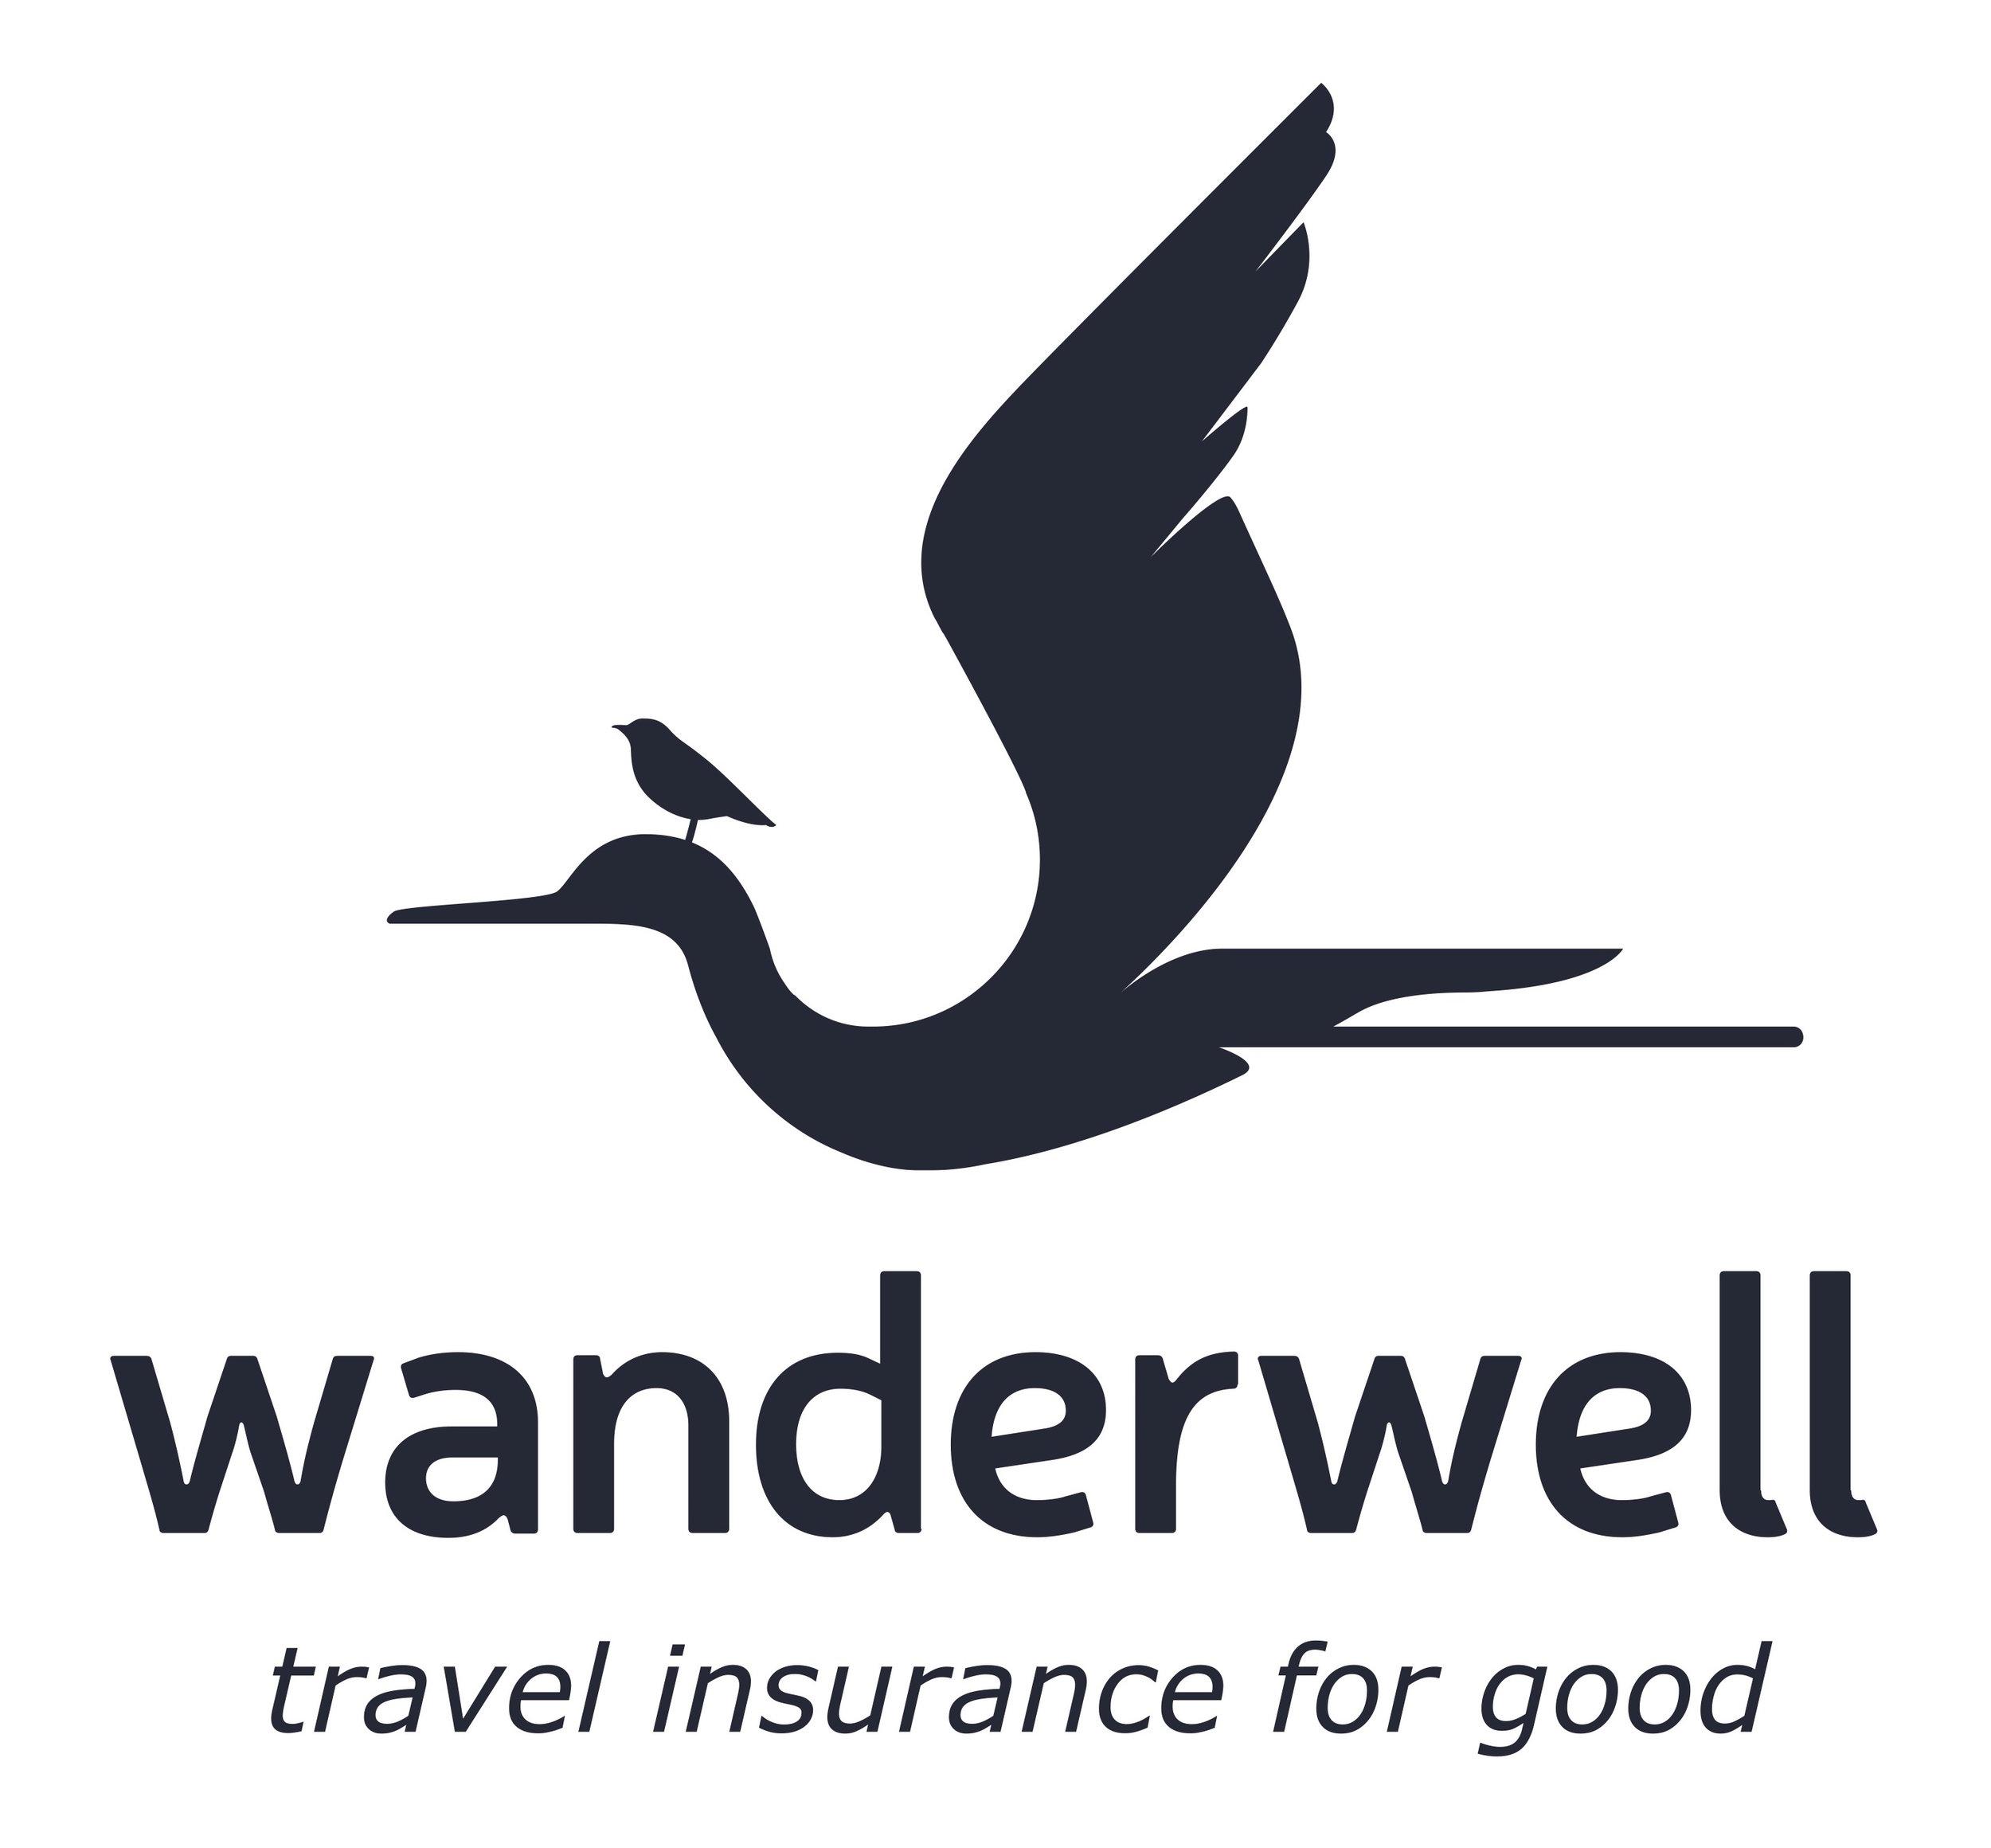 wanderwell logo.jpg